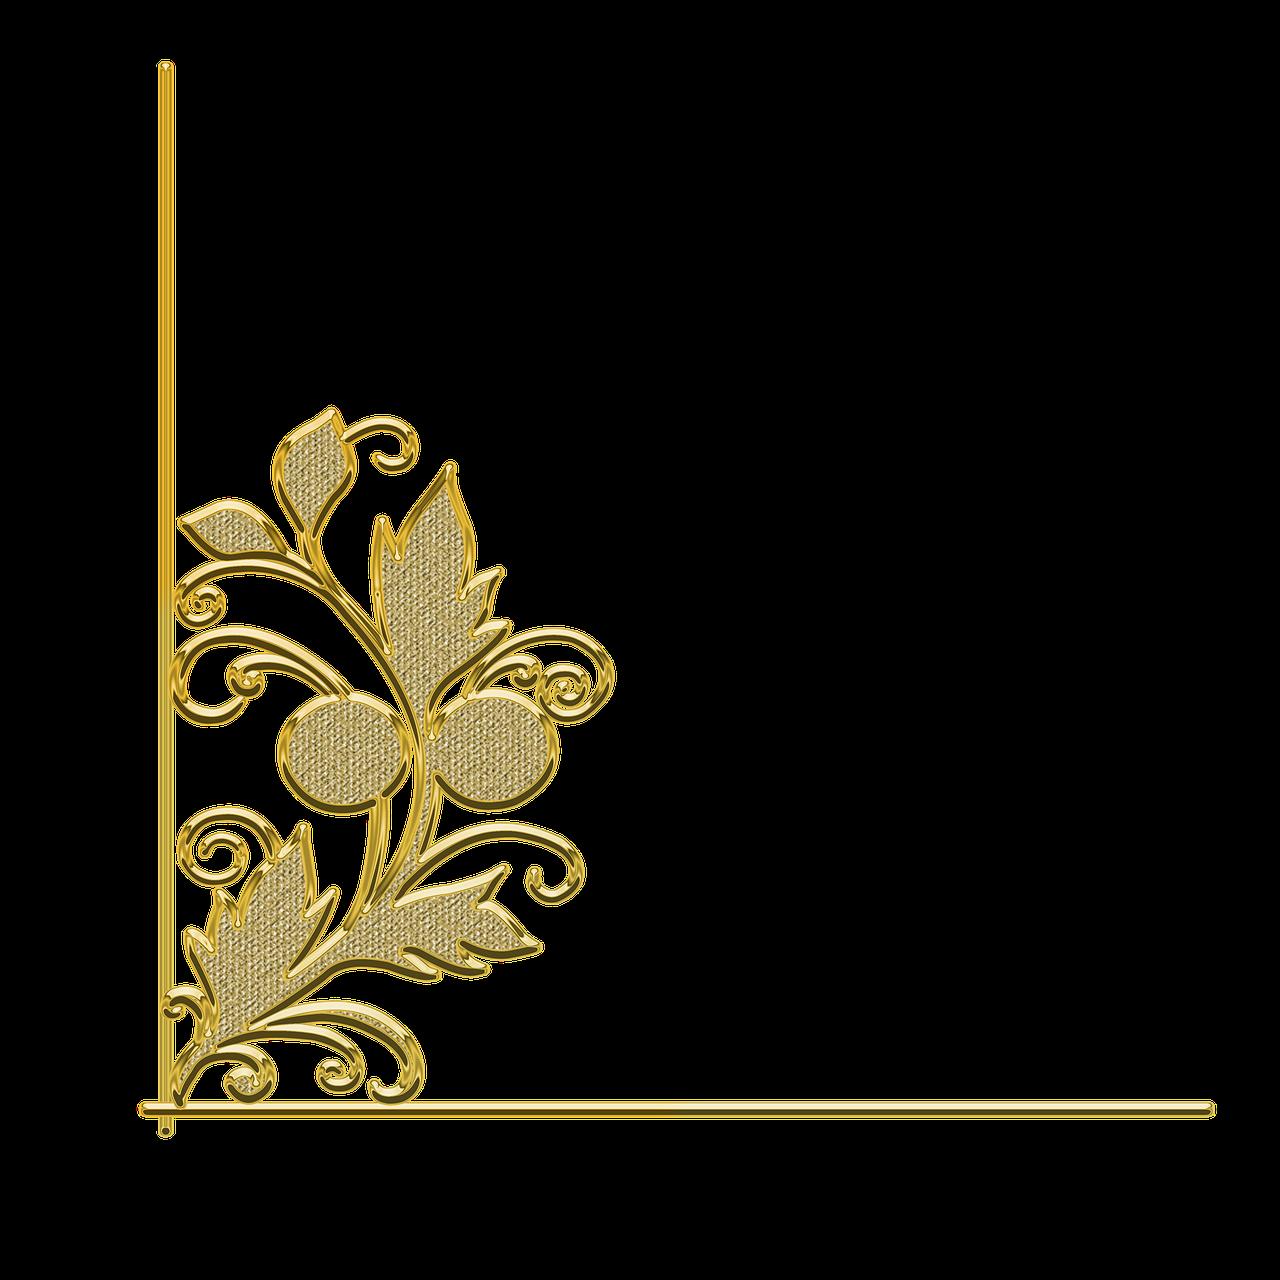 Golden,pattern,decor,frame,ornament